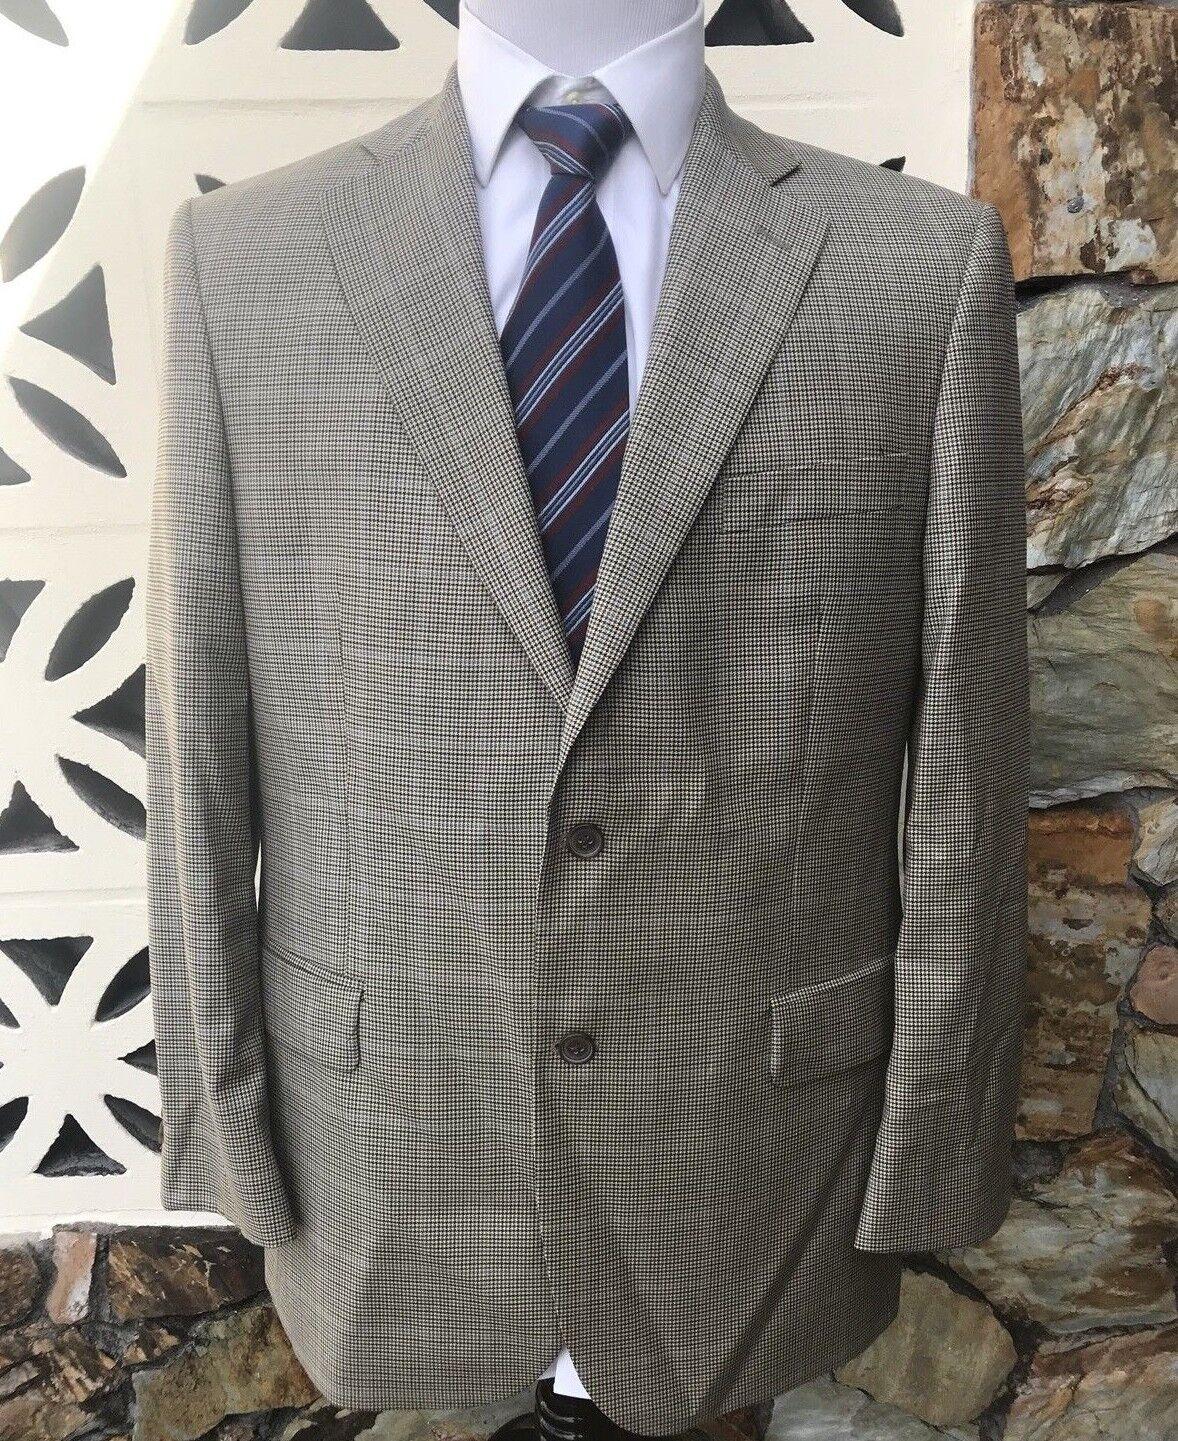 BROOKS BredHERS Men's Sports Coat Beige bluee Brown Houndstooth Size 42 R